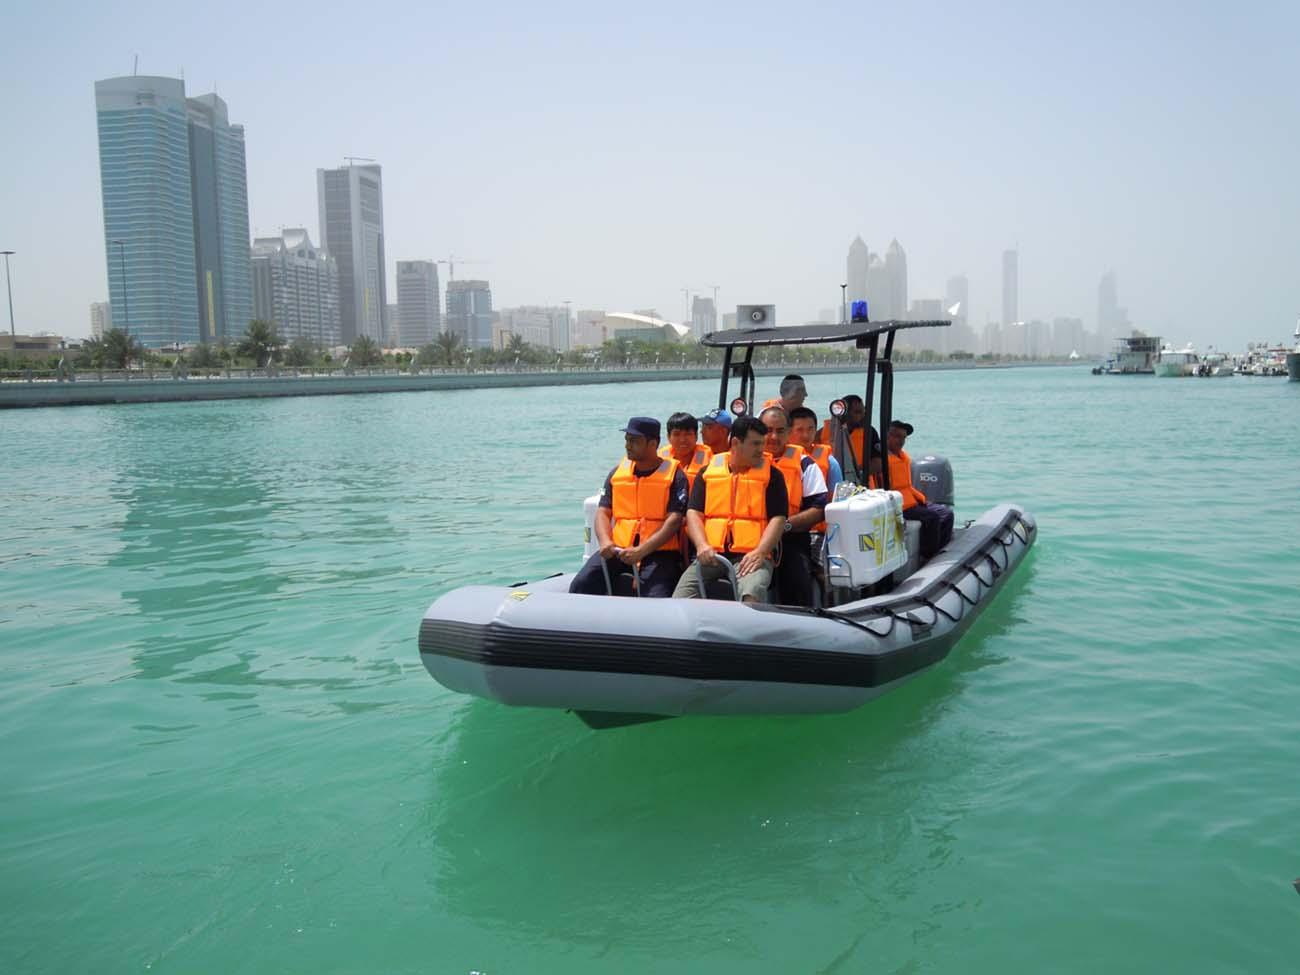 Zodiac - Training the Abu Dhabi airport rescue boat crews